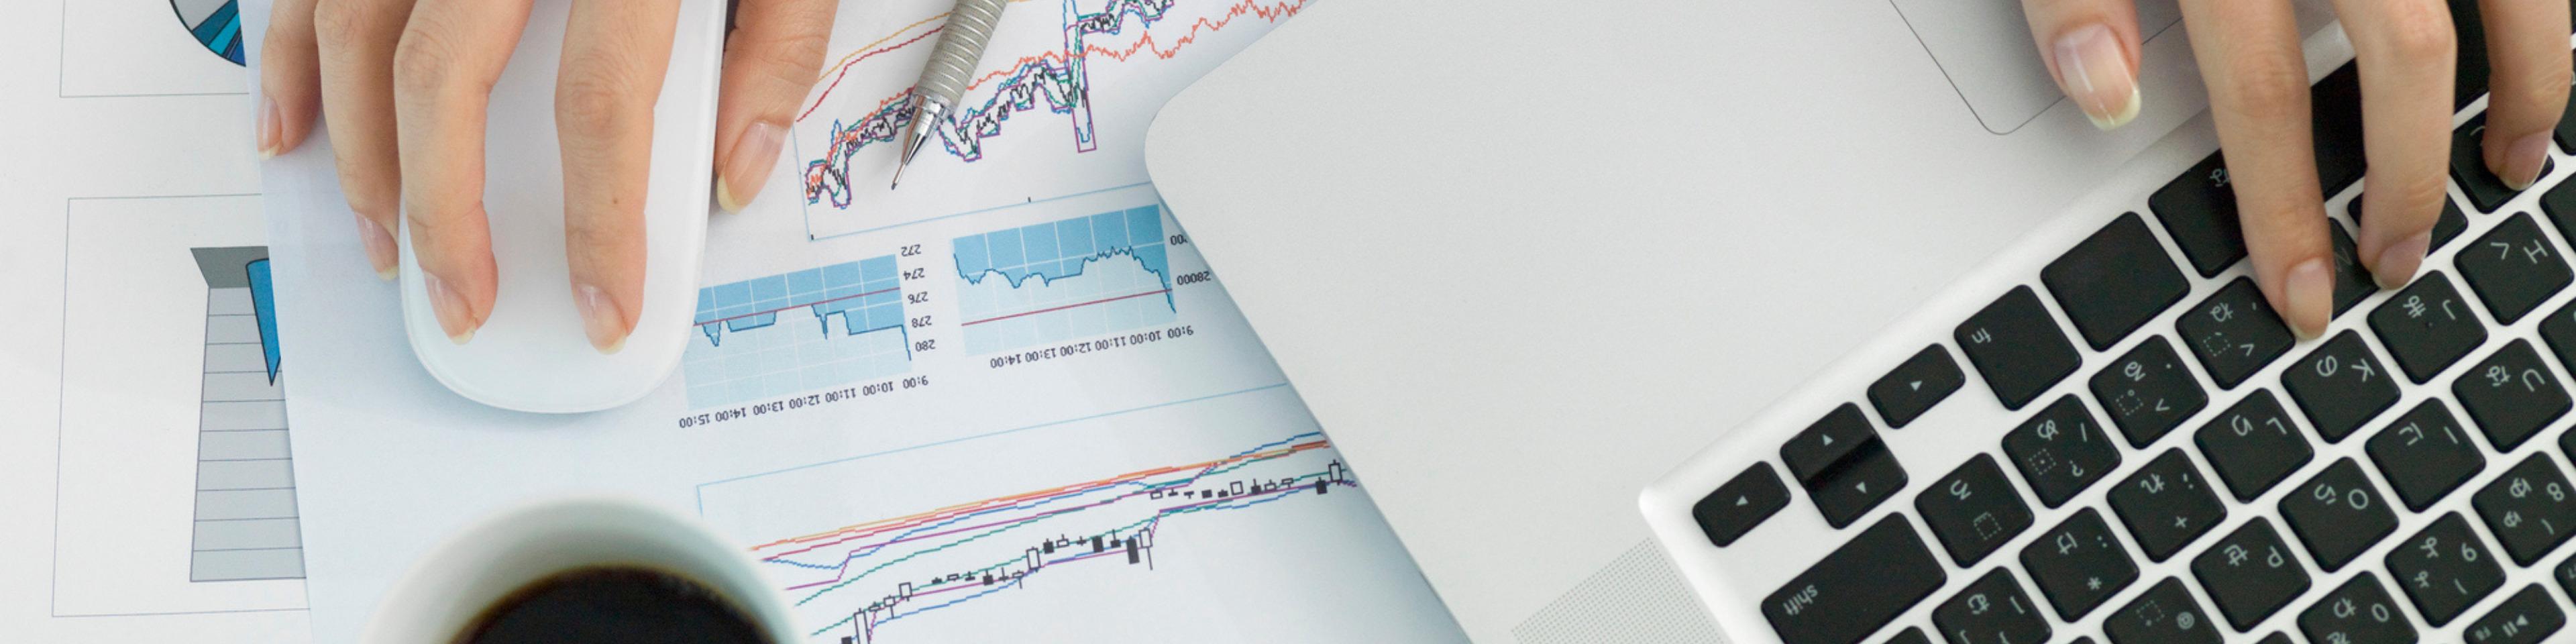 Hero tax software solution produce a full tax balance sheet